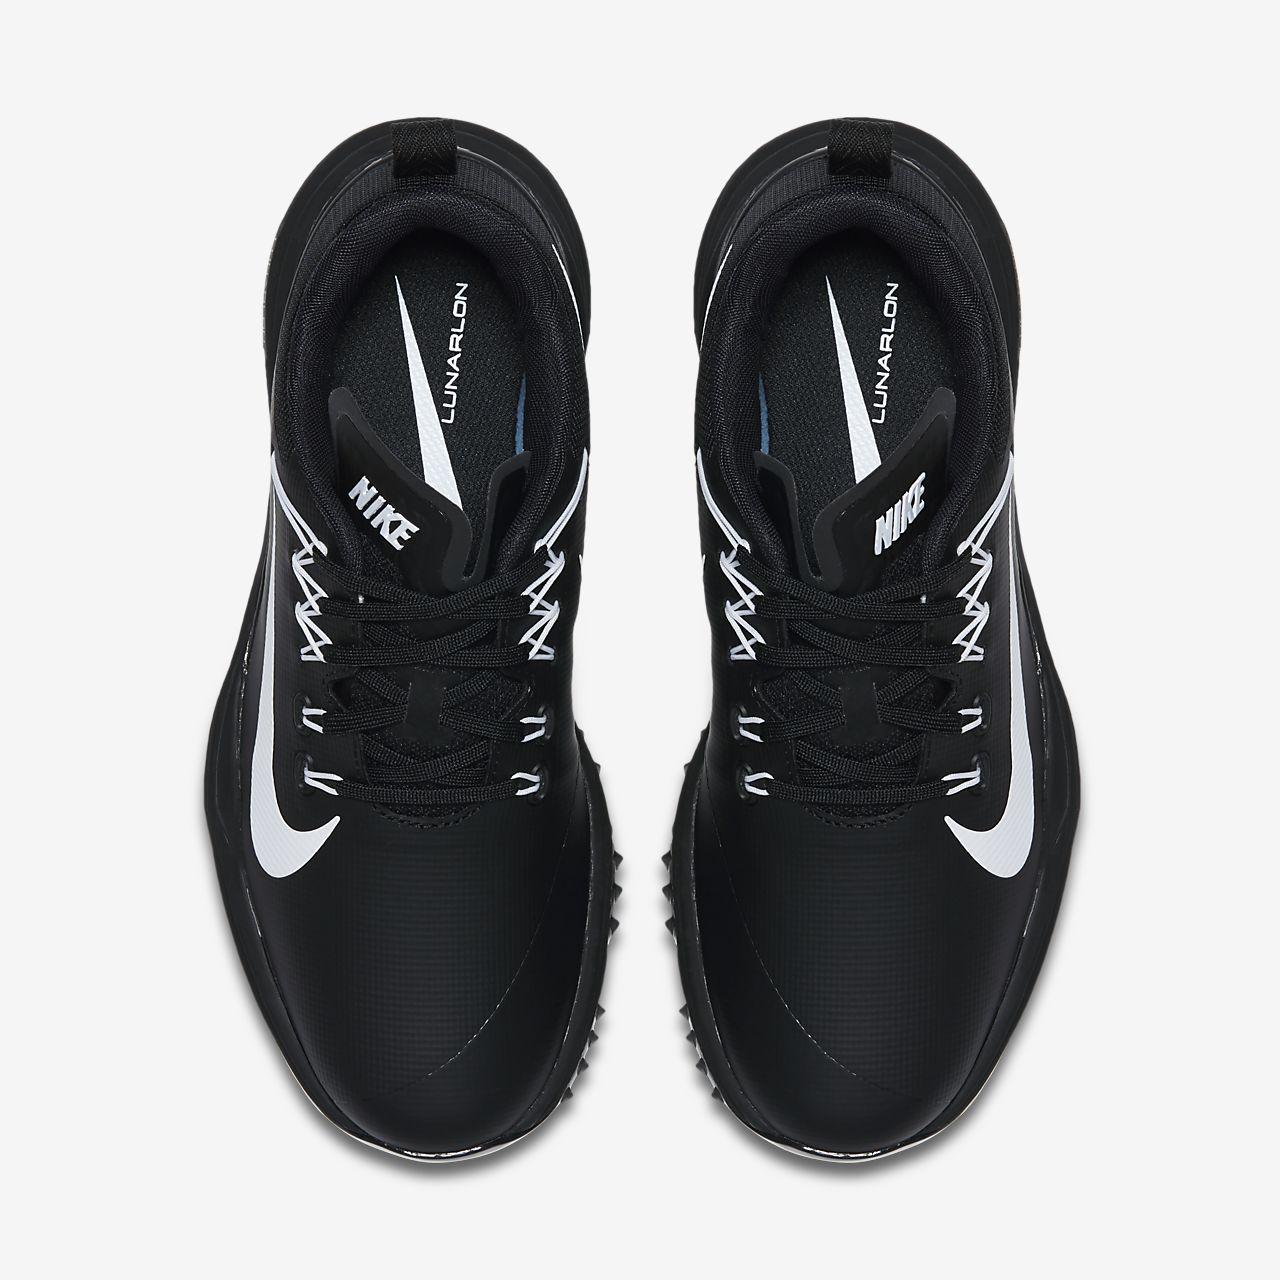 online retailer 0309b 3ec8d ... Chaussure de golf Nike Lunar Command 2 pour Femme